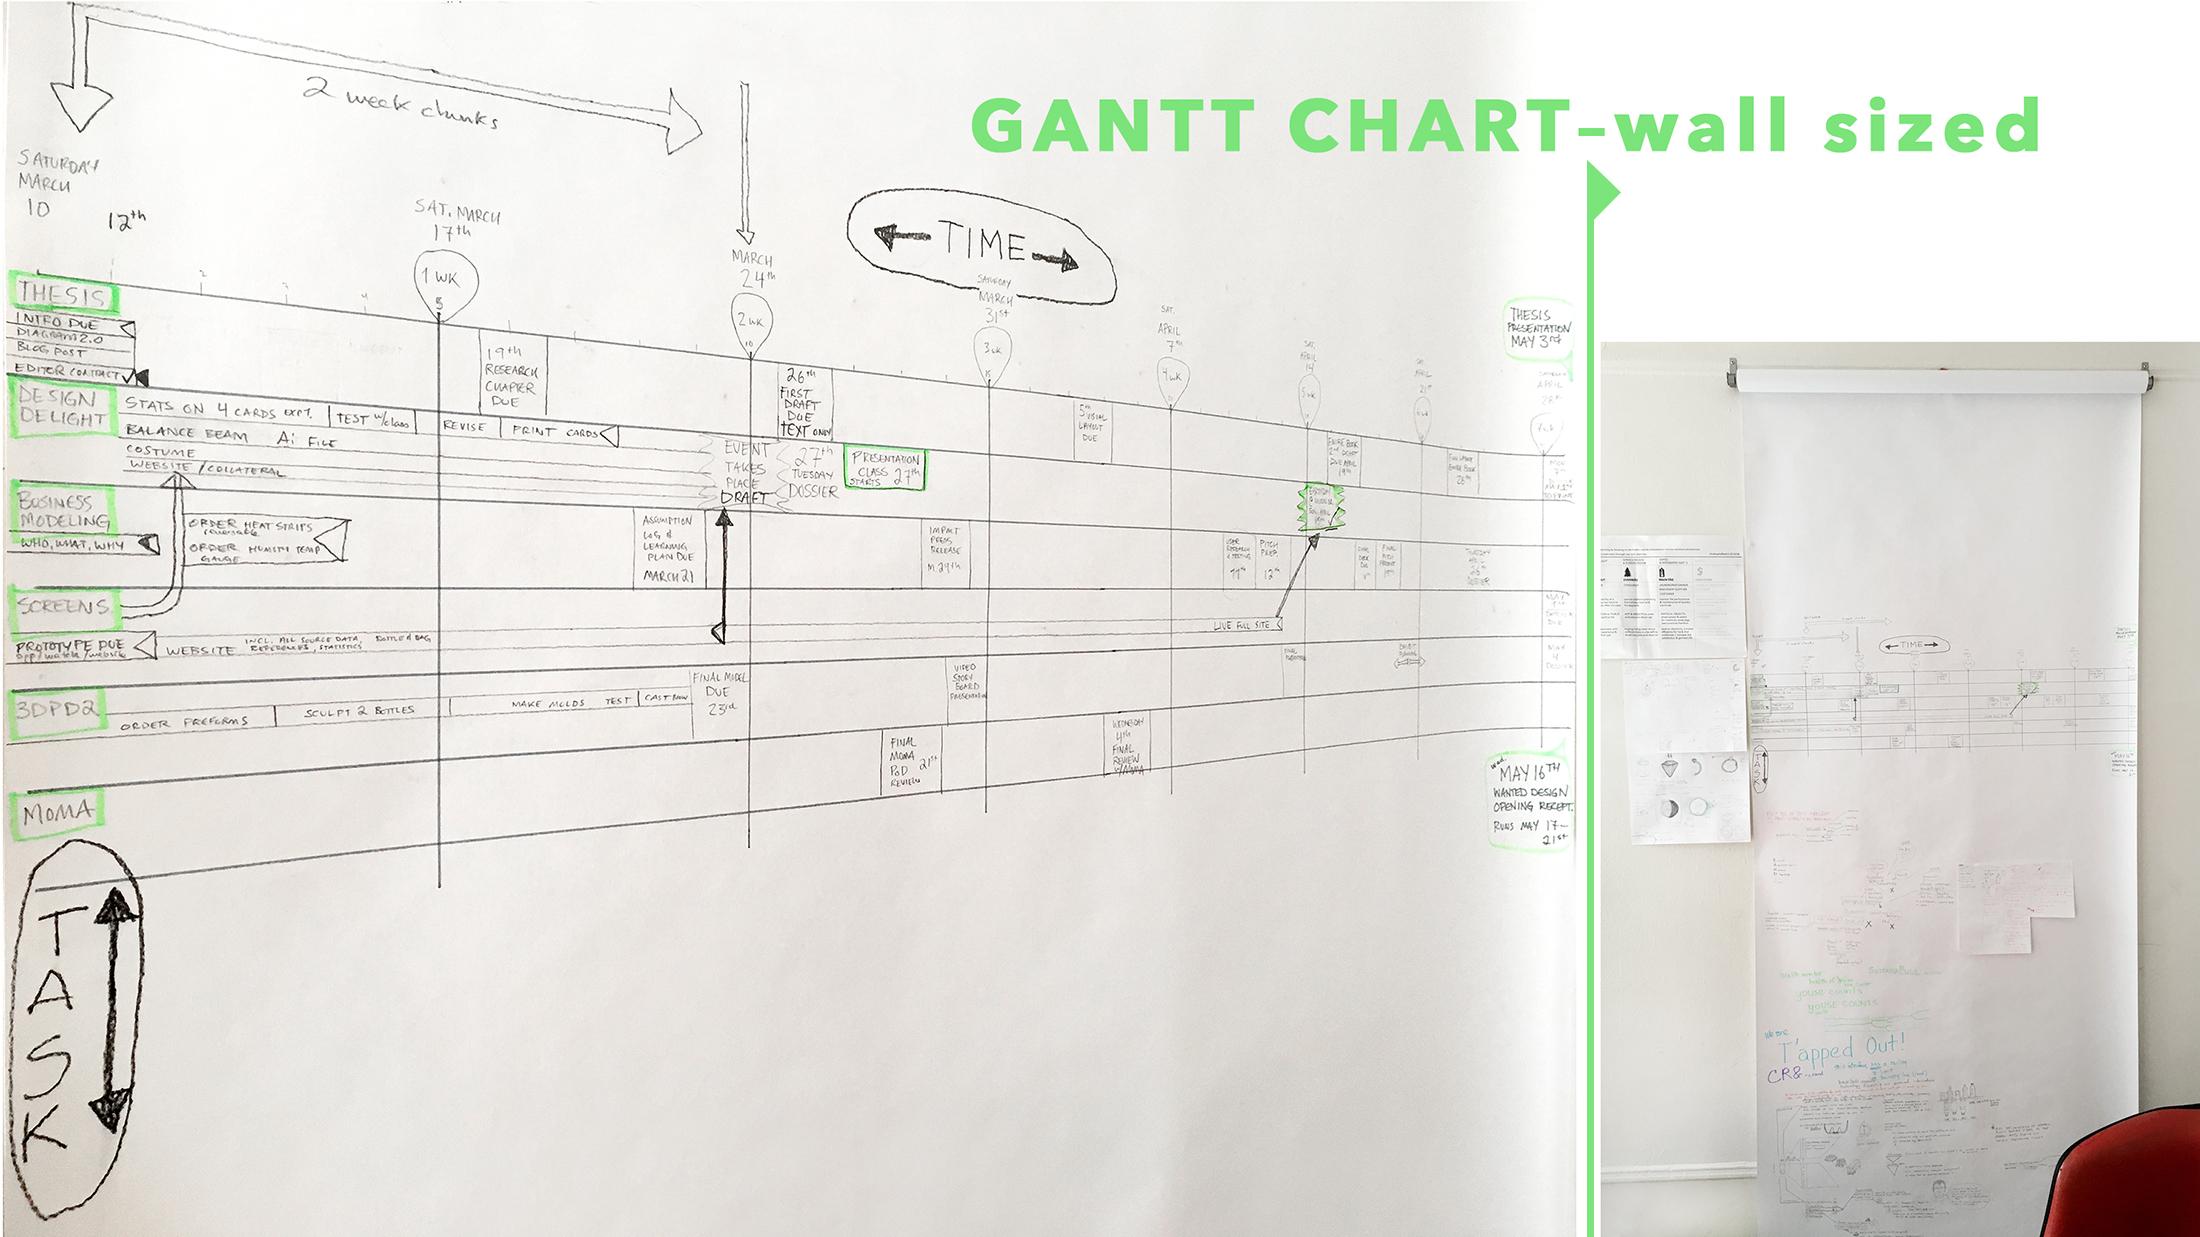 Gantt diagram on a 3 foot wide spool of paper.